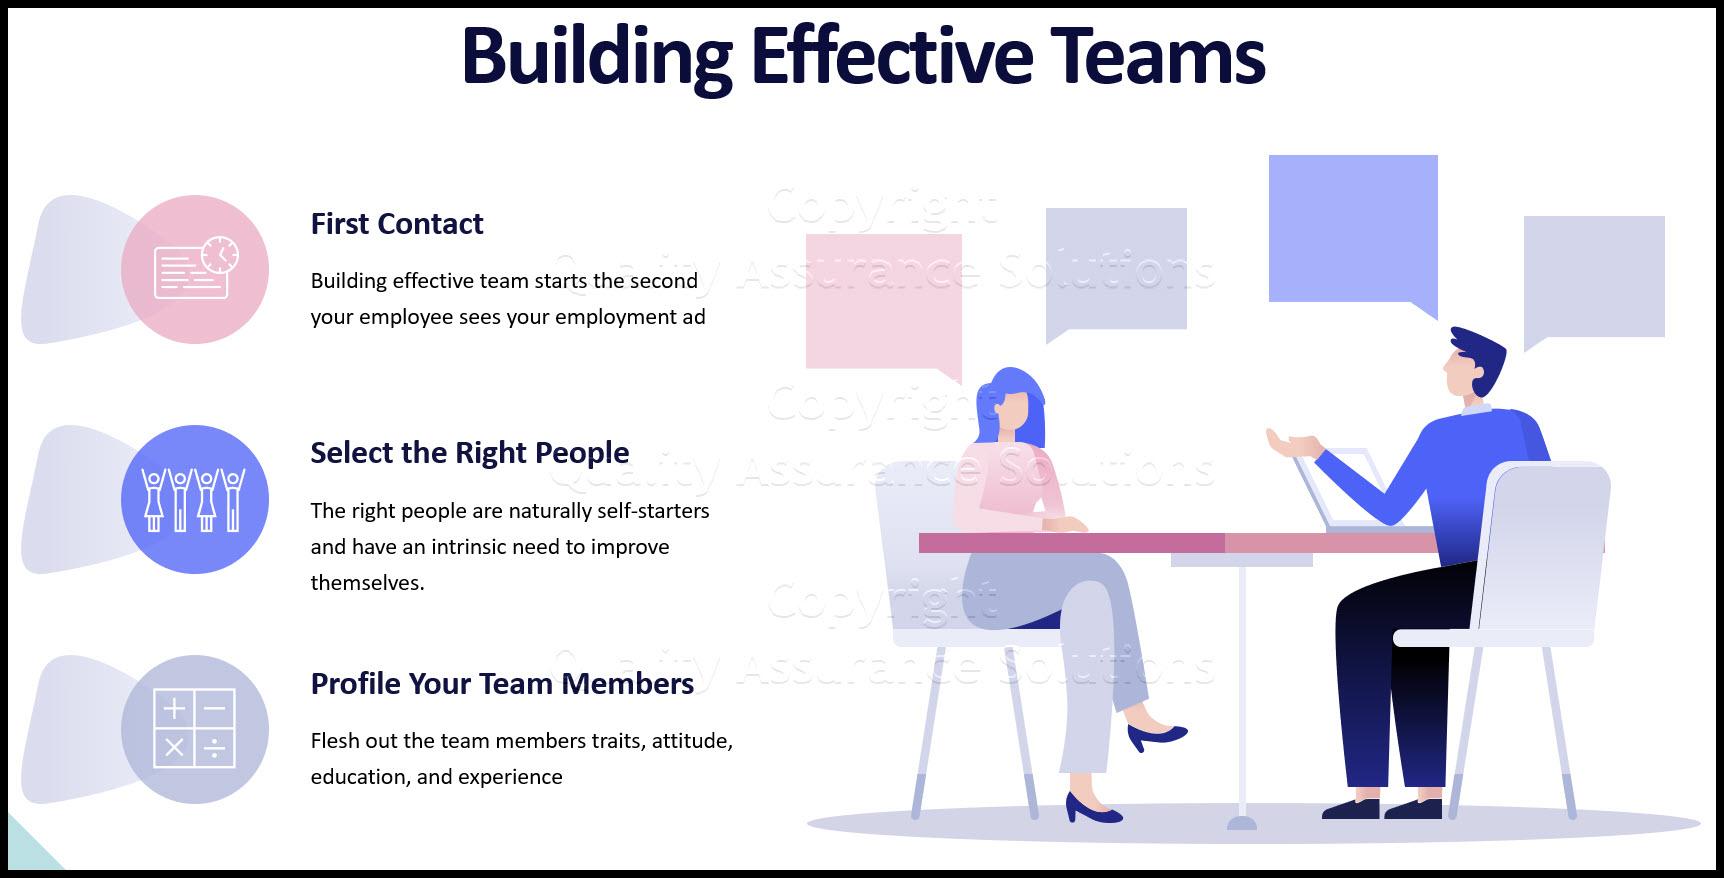 Building Effective Teams slide